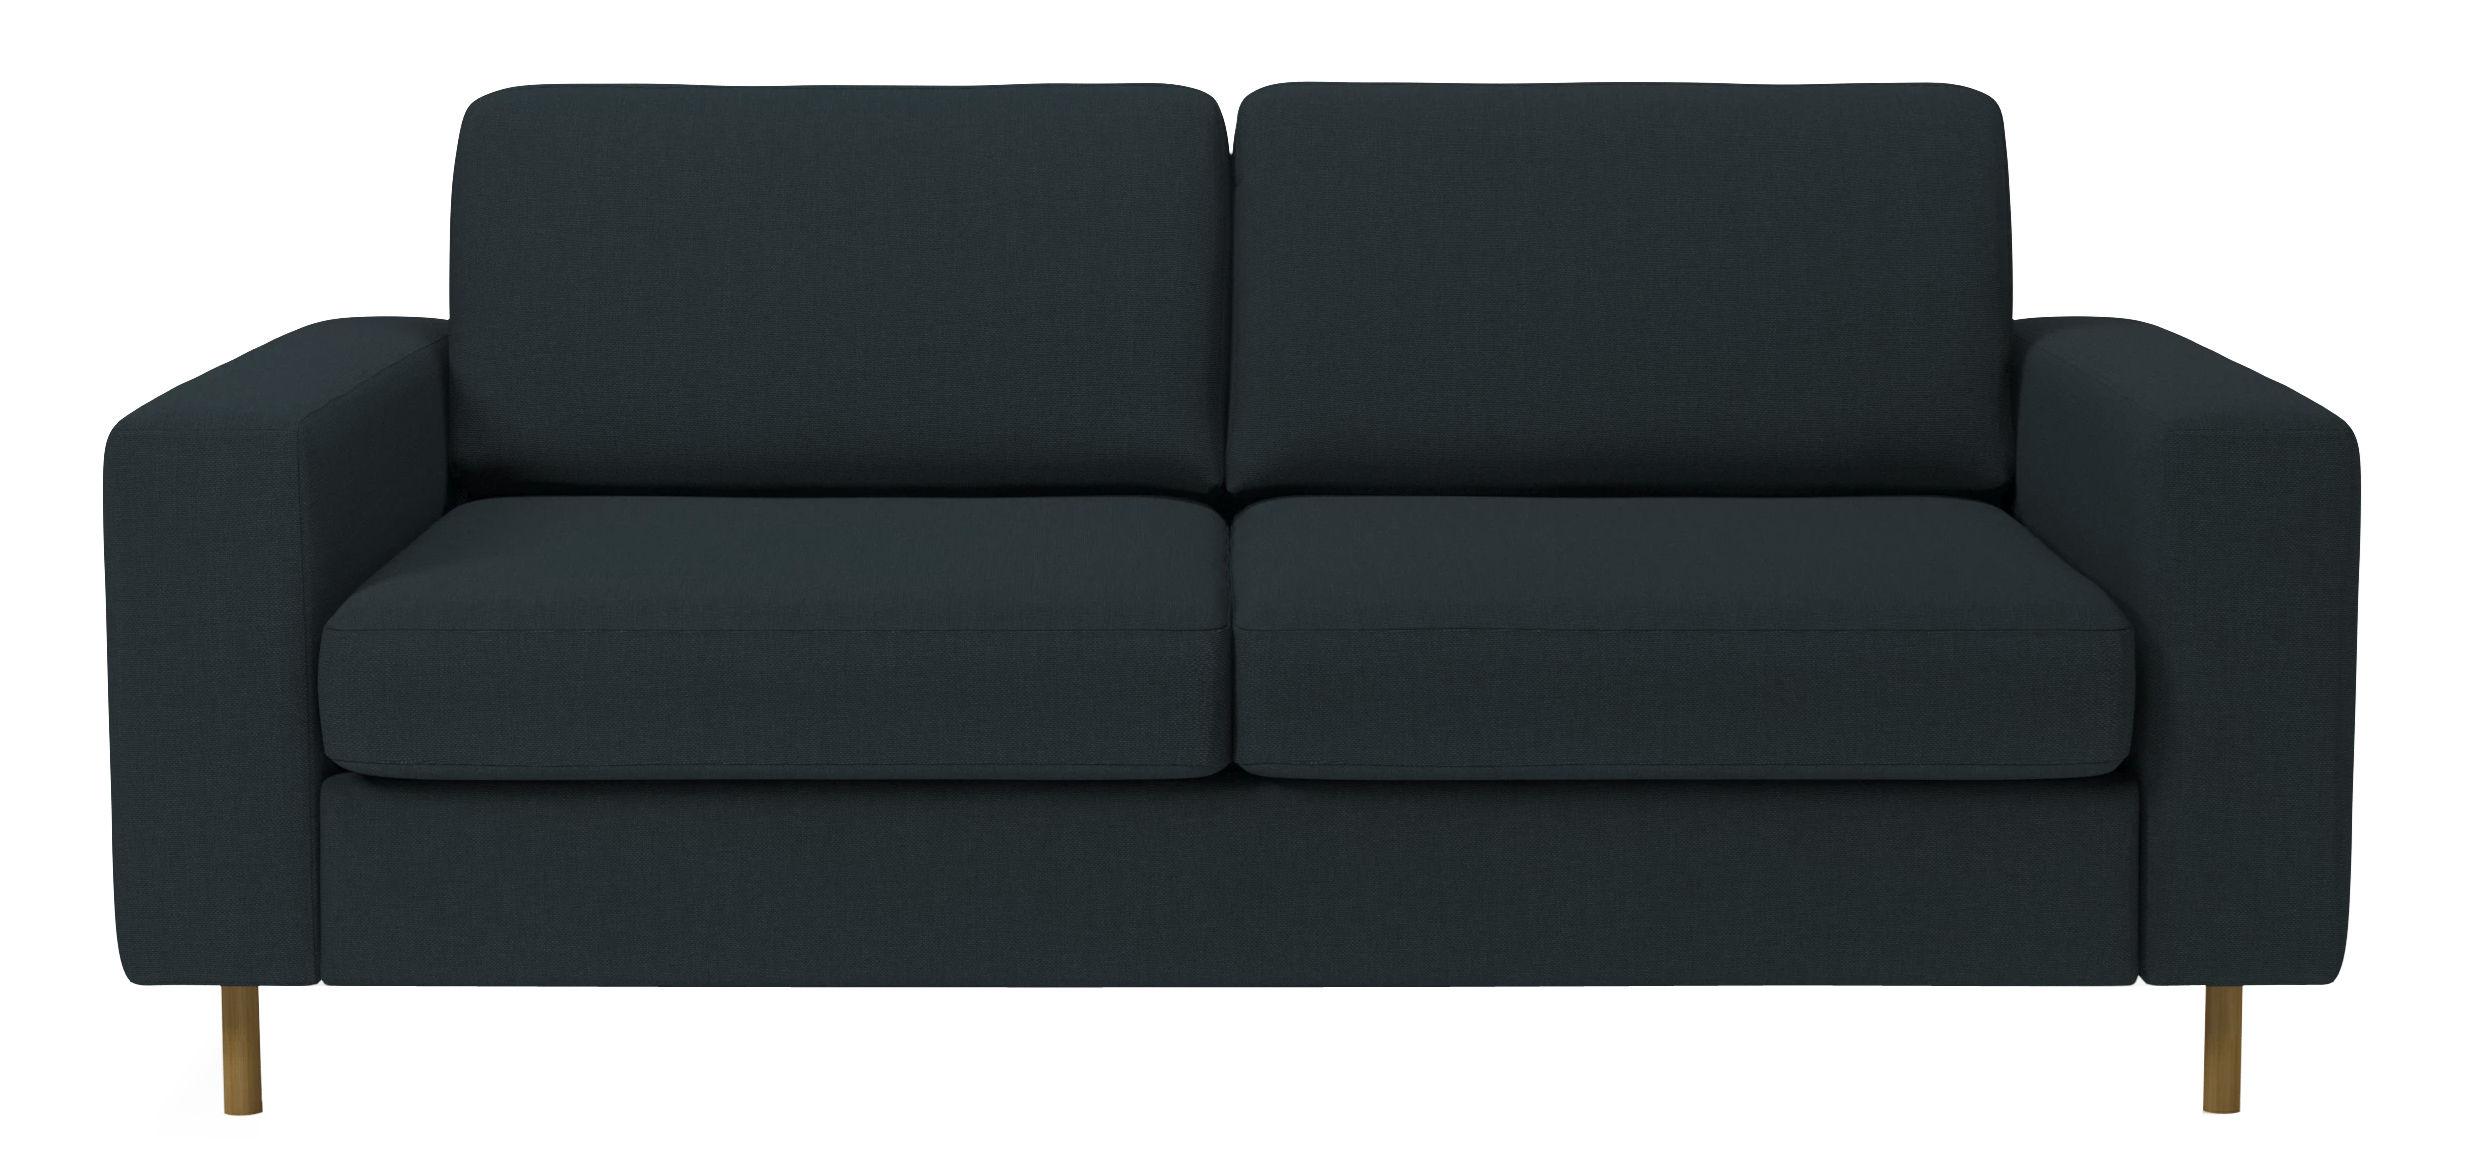 canap convertible scandinavia 2 places l 208 cm bleu. Black Bedroom Furniture Sets. Home Design Ideas